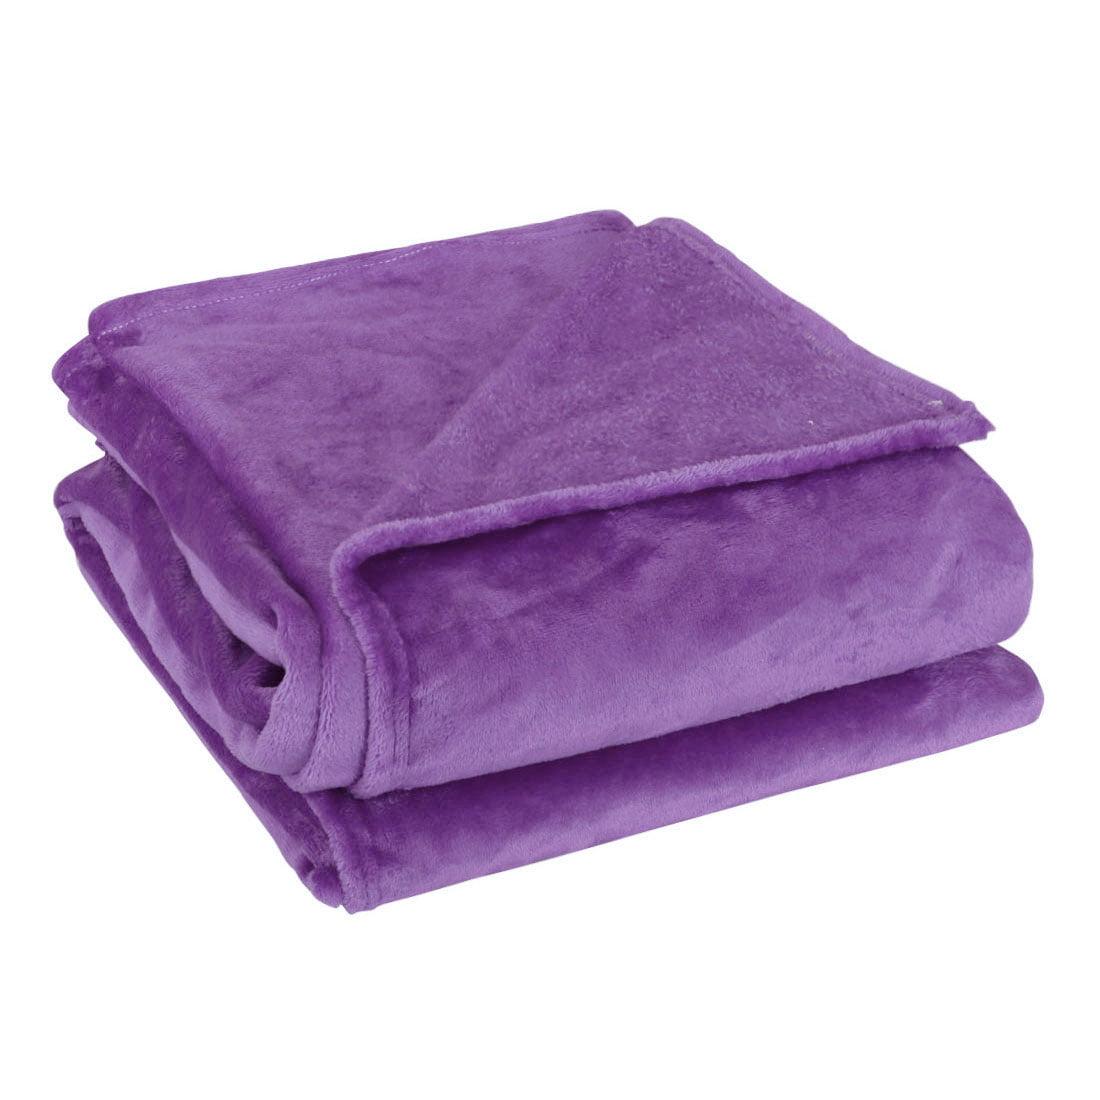 Dark Purple 71 X 78 Inch Home Bed Sofa Soft Fleece Throws Blanket Warm Full